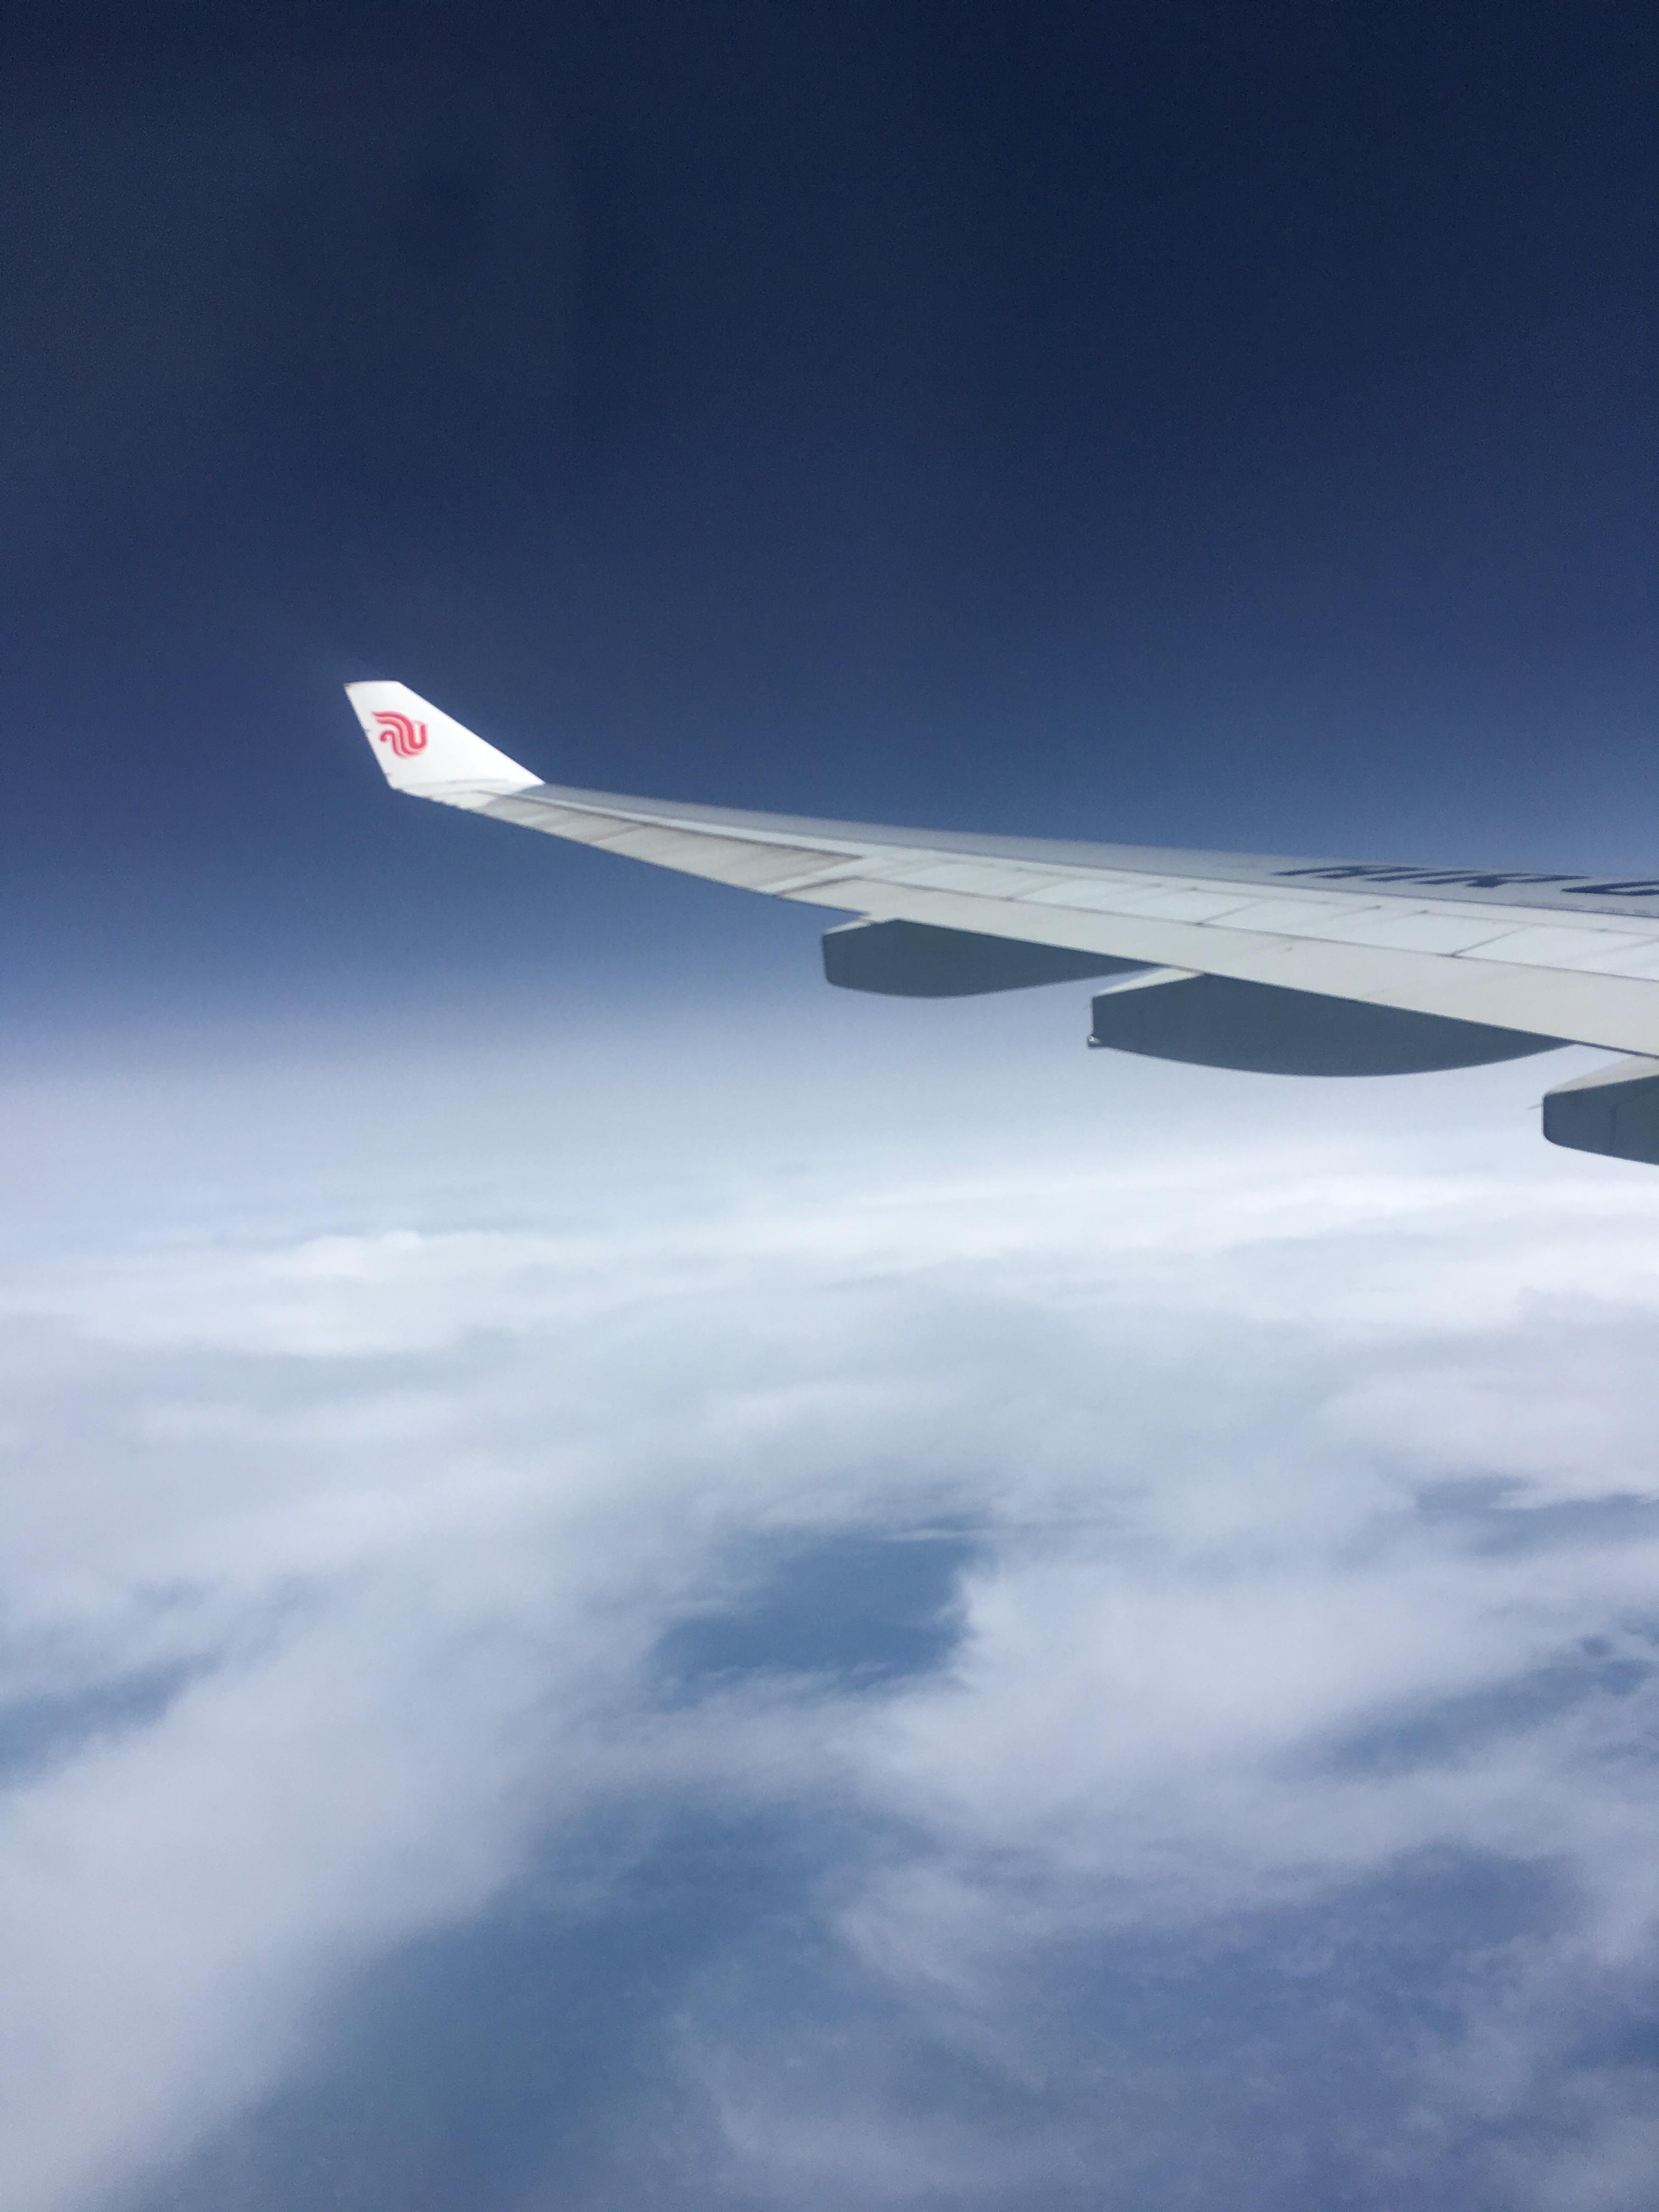 Re:[原创]~骚年飞行篇~补充半年前的CA111:PEK-HKG,有幸坐到大擦第50架A330!